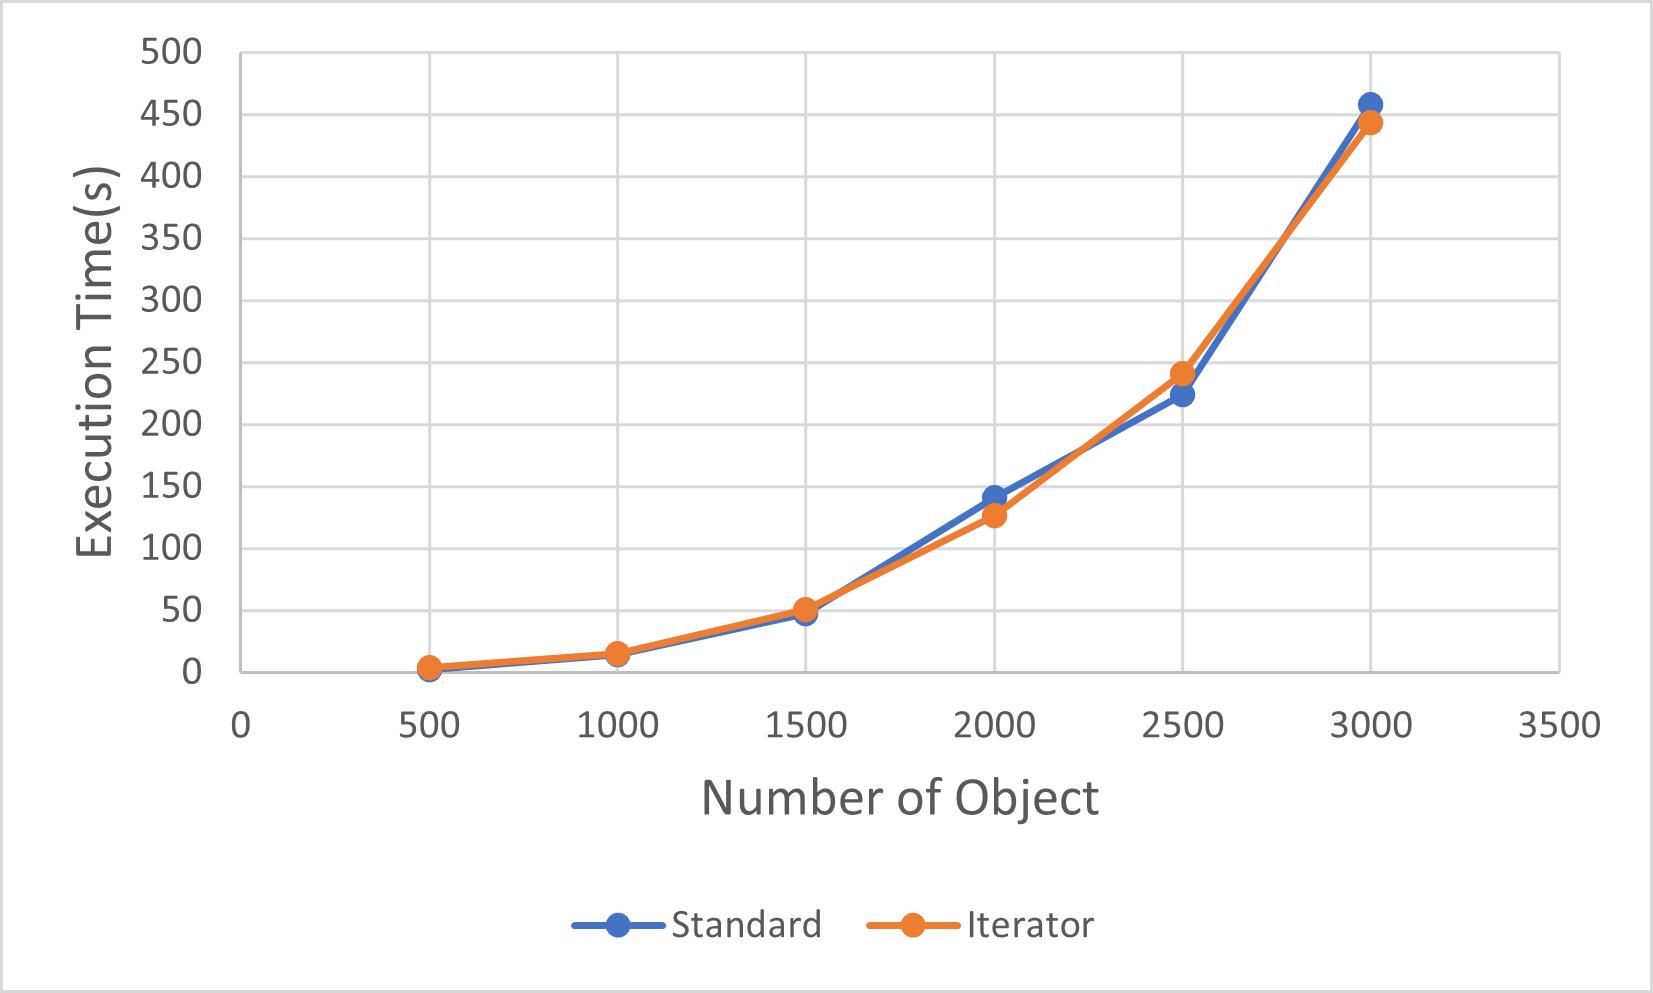 Iterator_vs_Standard_for